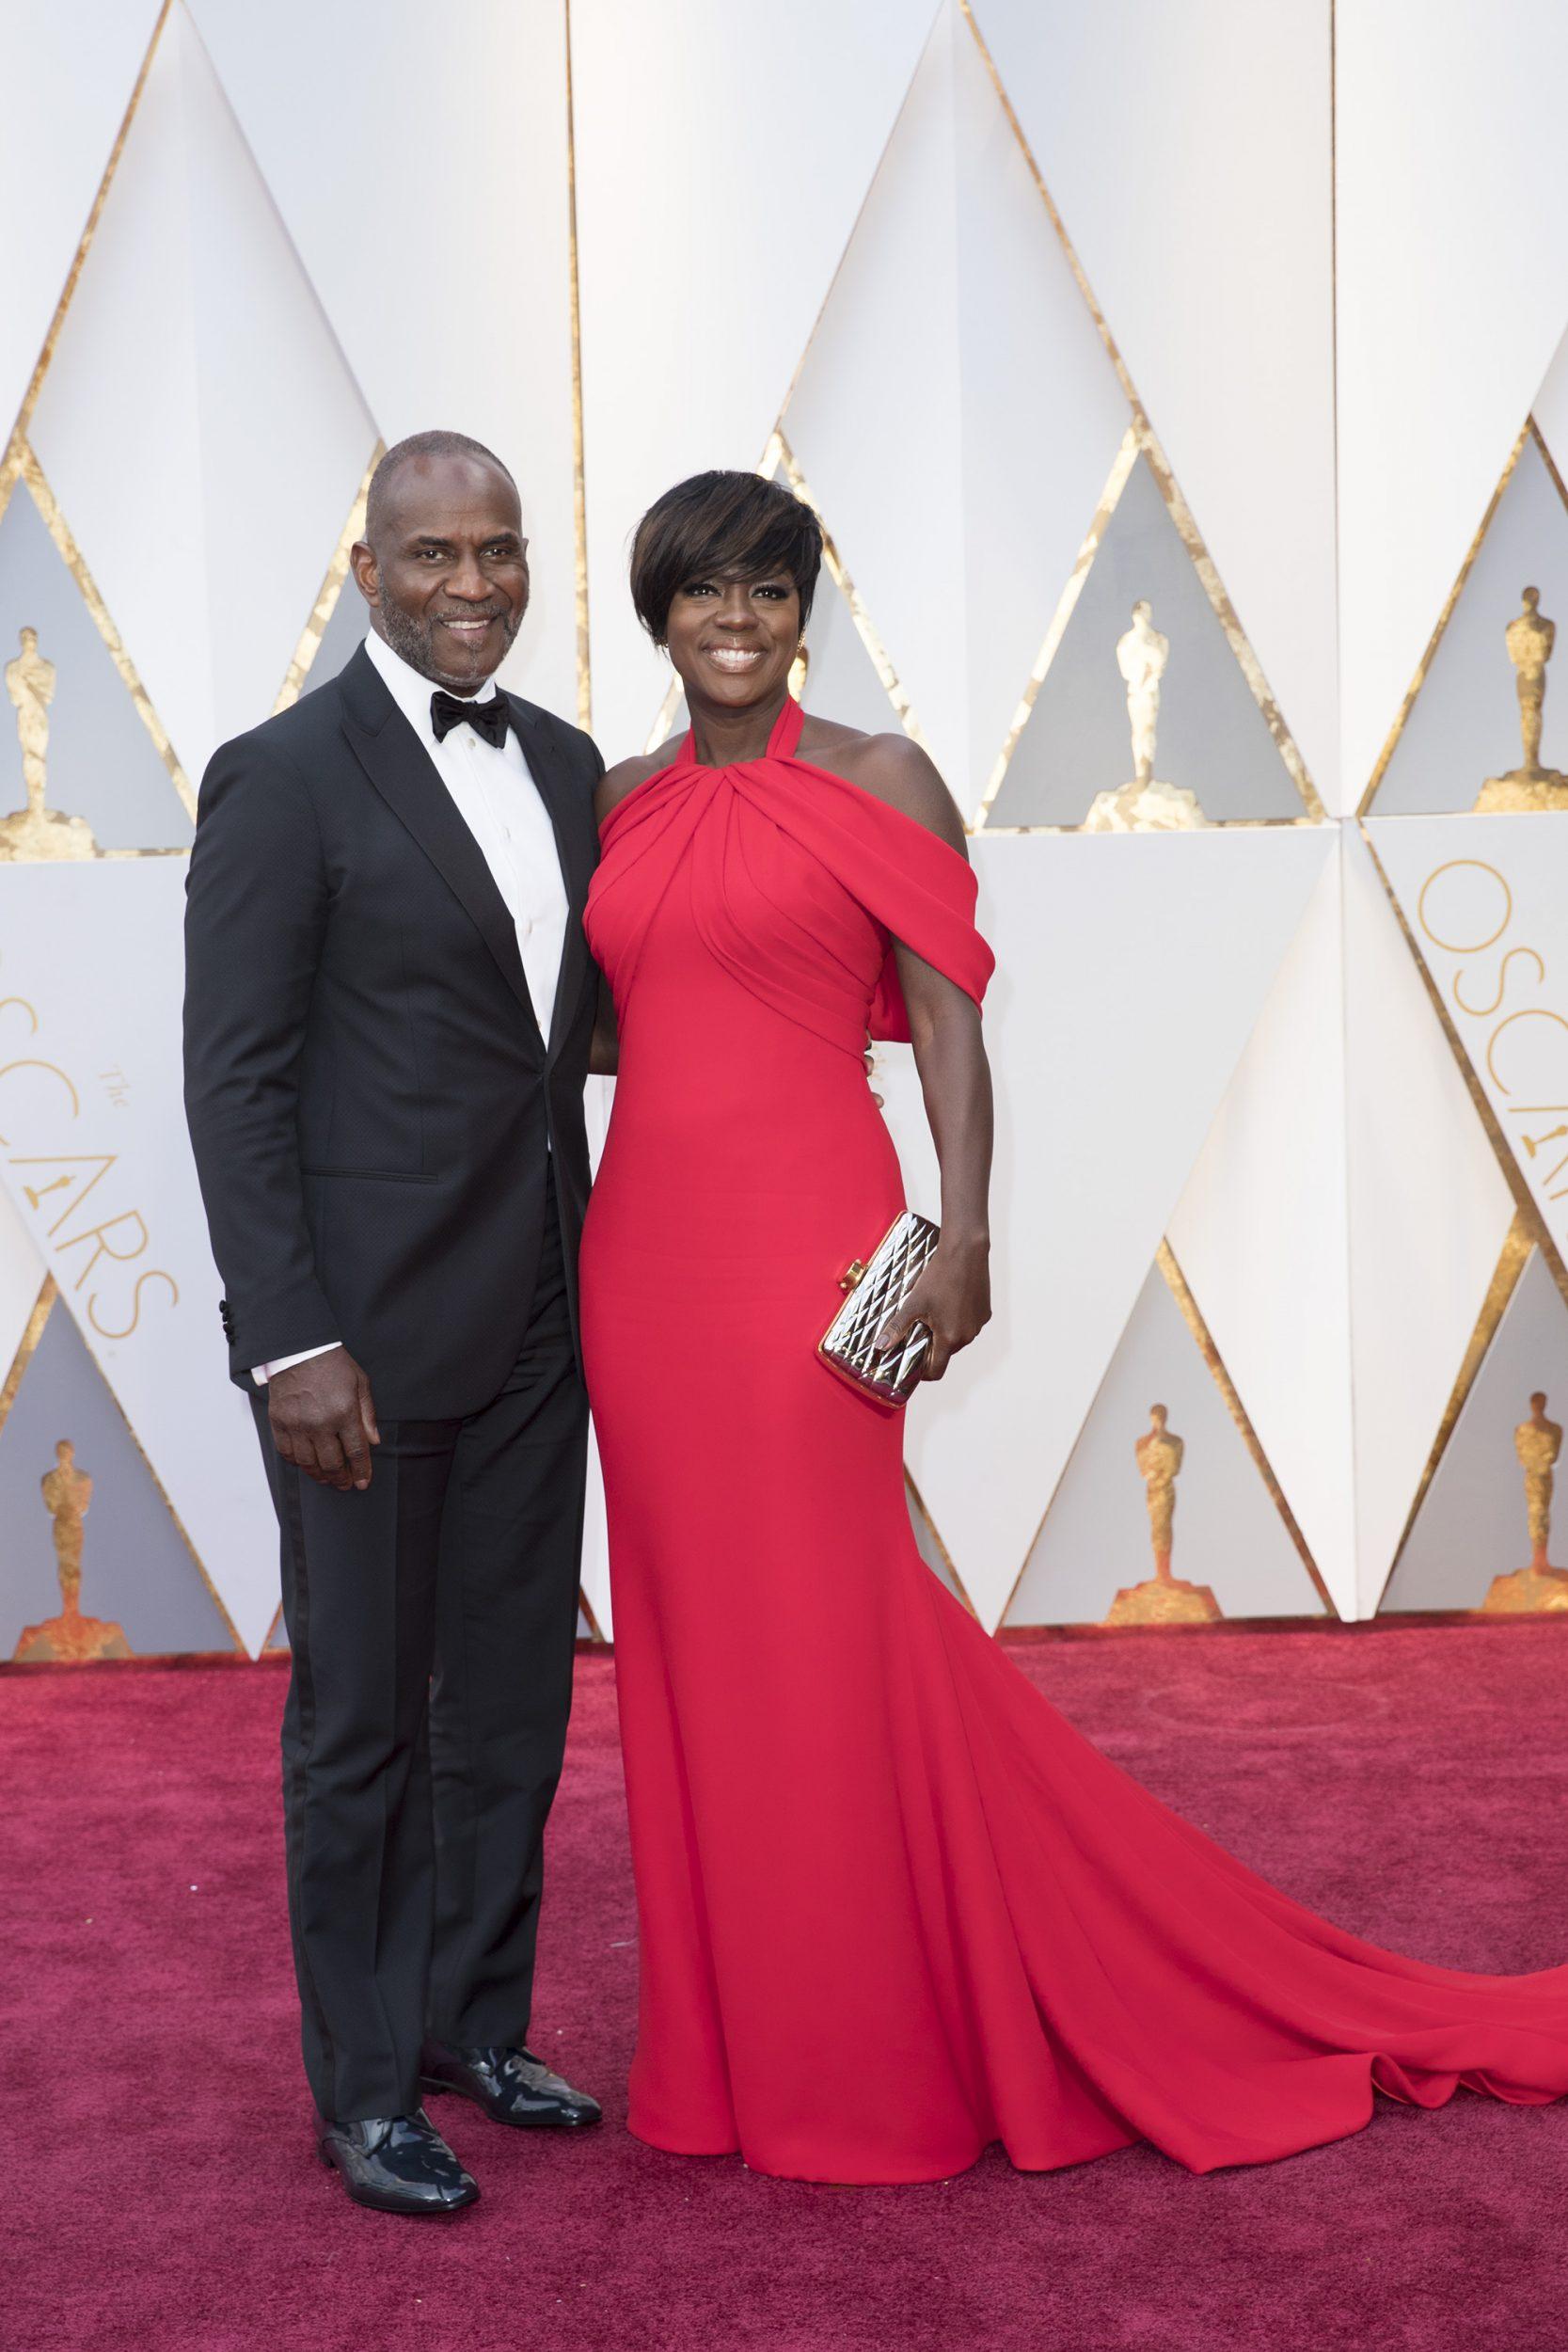 THE OSCARS(r) - The 89th Oscars(r)  broadcasts live on Oscar(r) SUNDAY, FEBRUARY 26, 2017, on the ABC Television Network. (ABC/Tyler Golden) JULIUS TENNON, VIOLA DAVIS